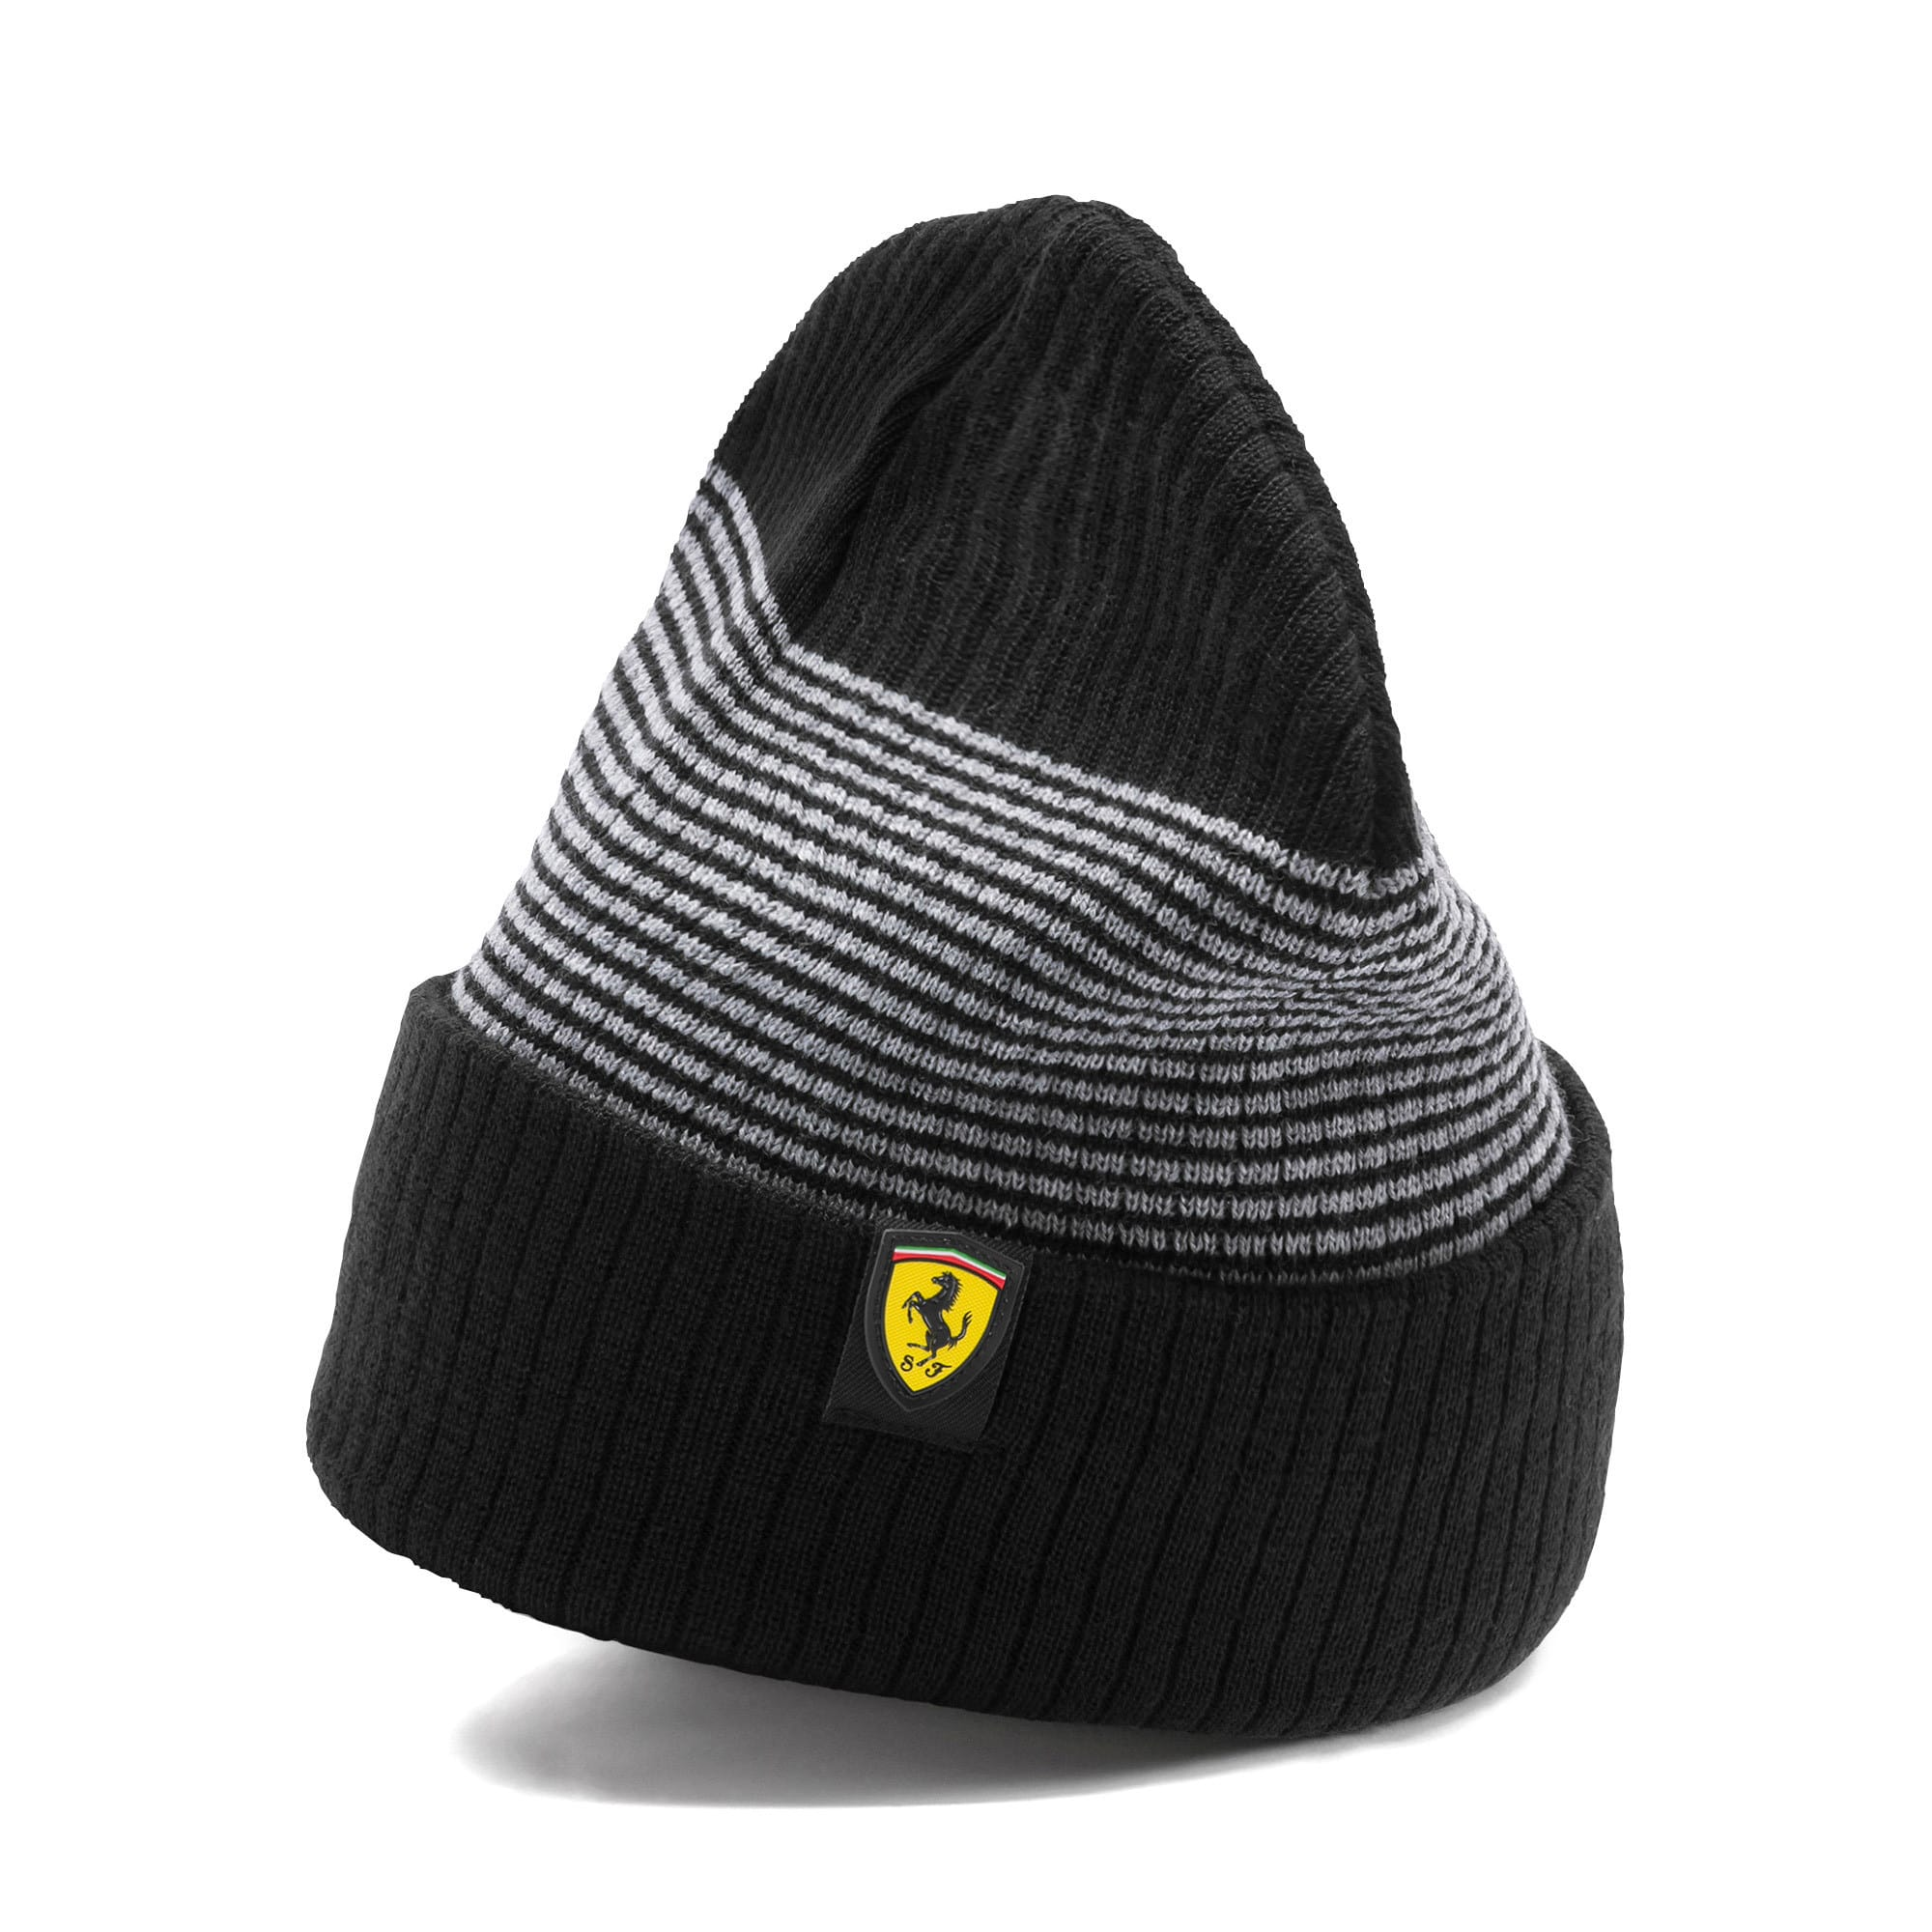 Thumbnail 1 of Scuderia Ferrari Fanwear Beanie, Puma Black, medium